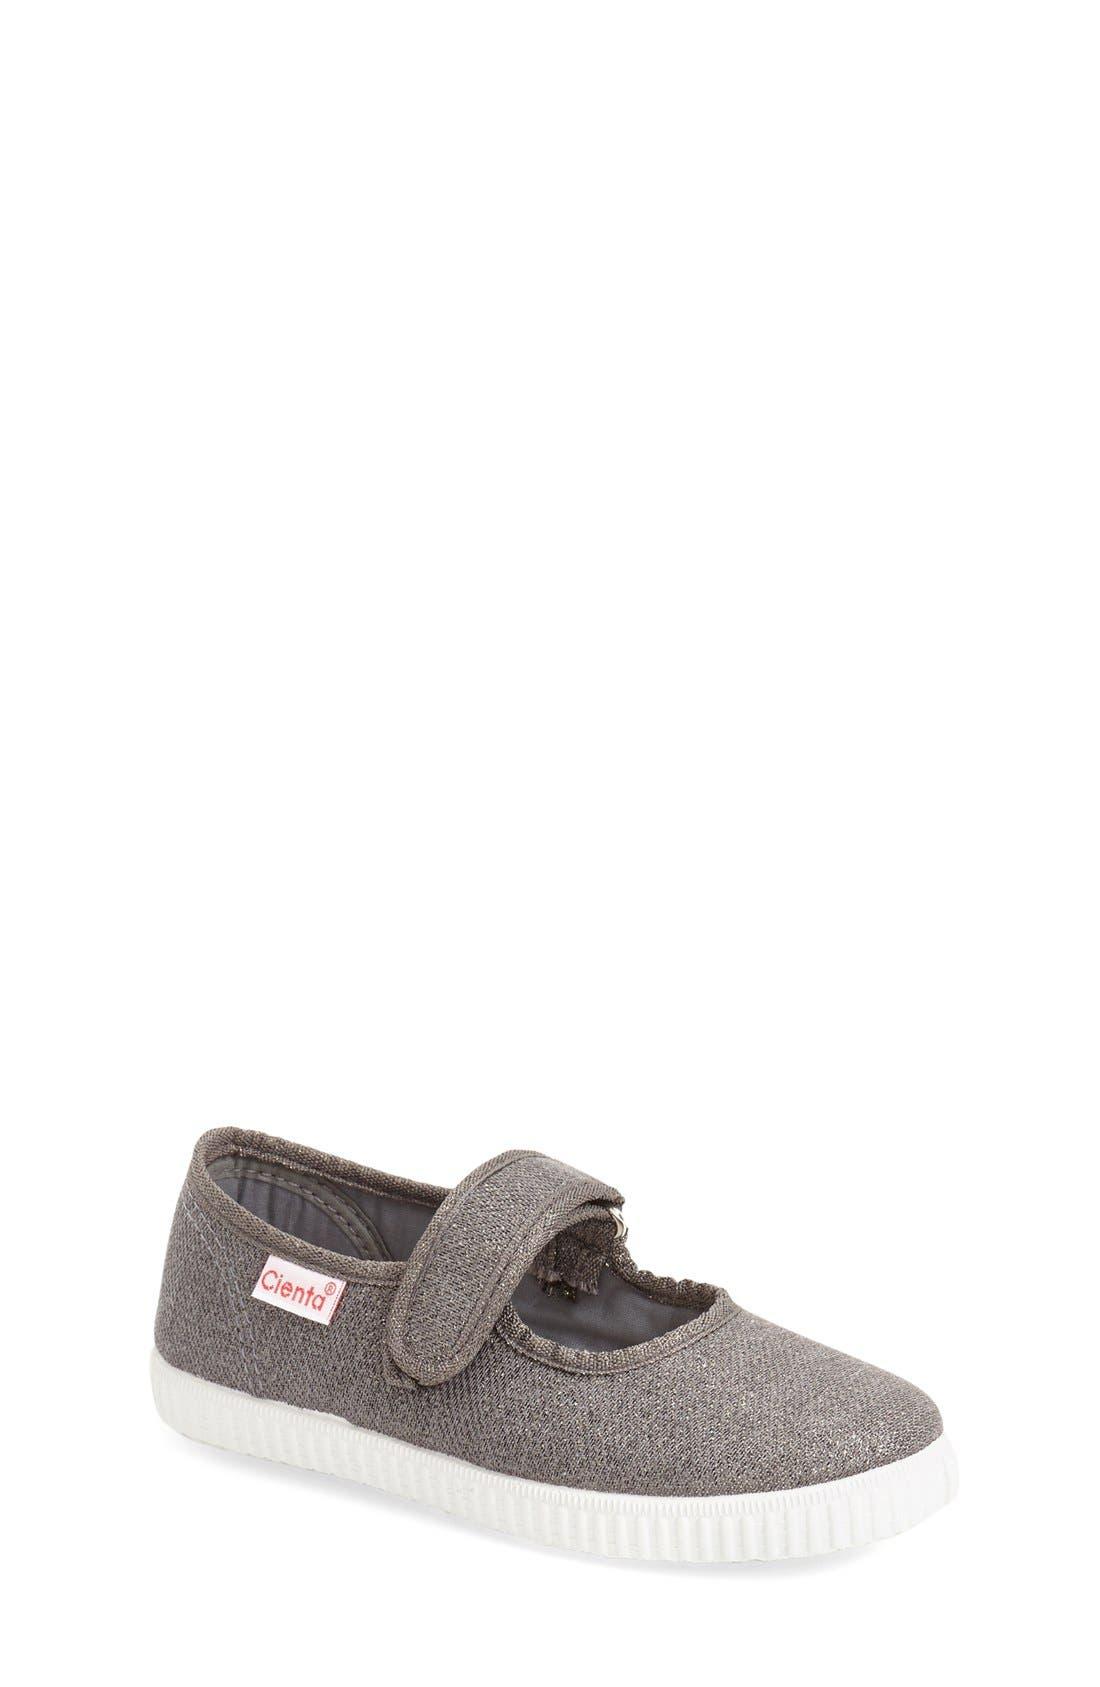 Cienta Mary Jane Sneaker (Walker, Toddler & Little Kid)